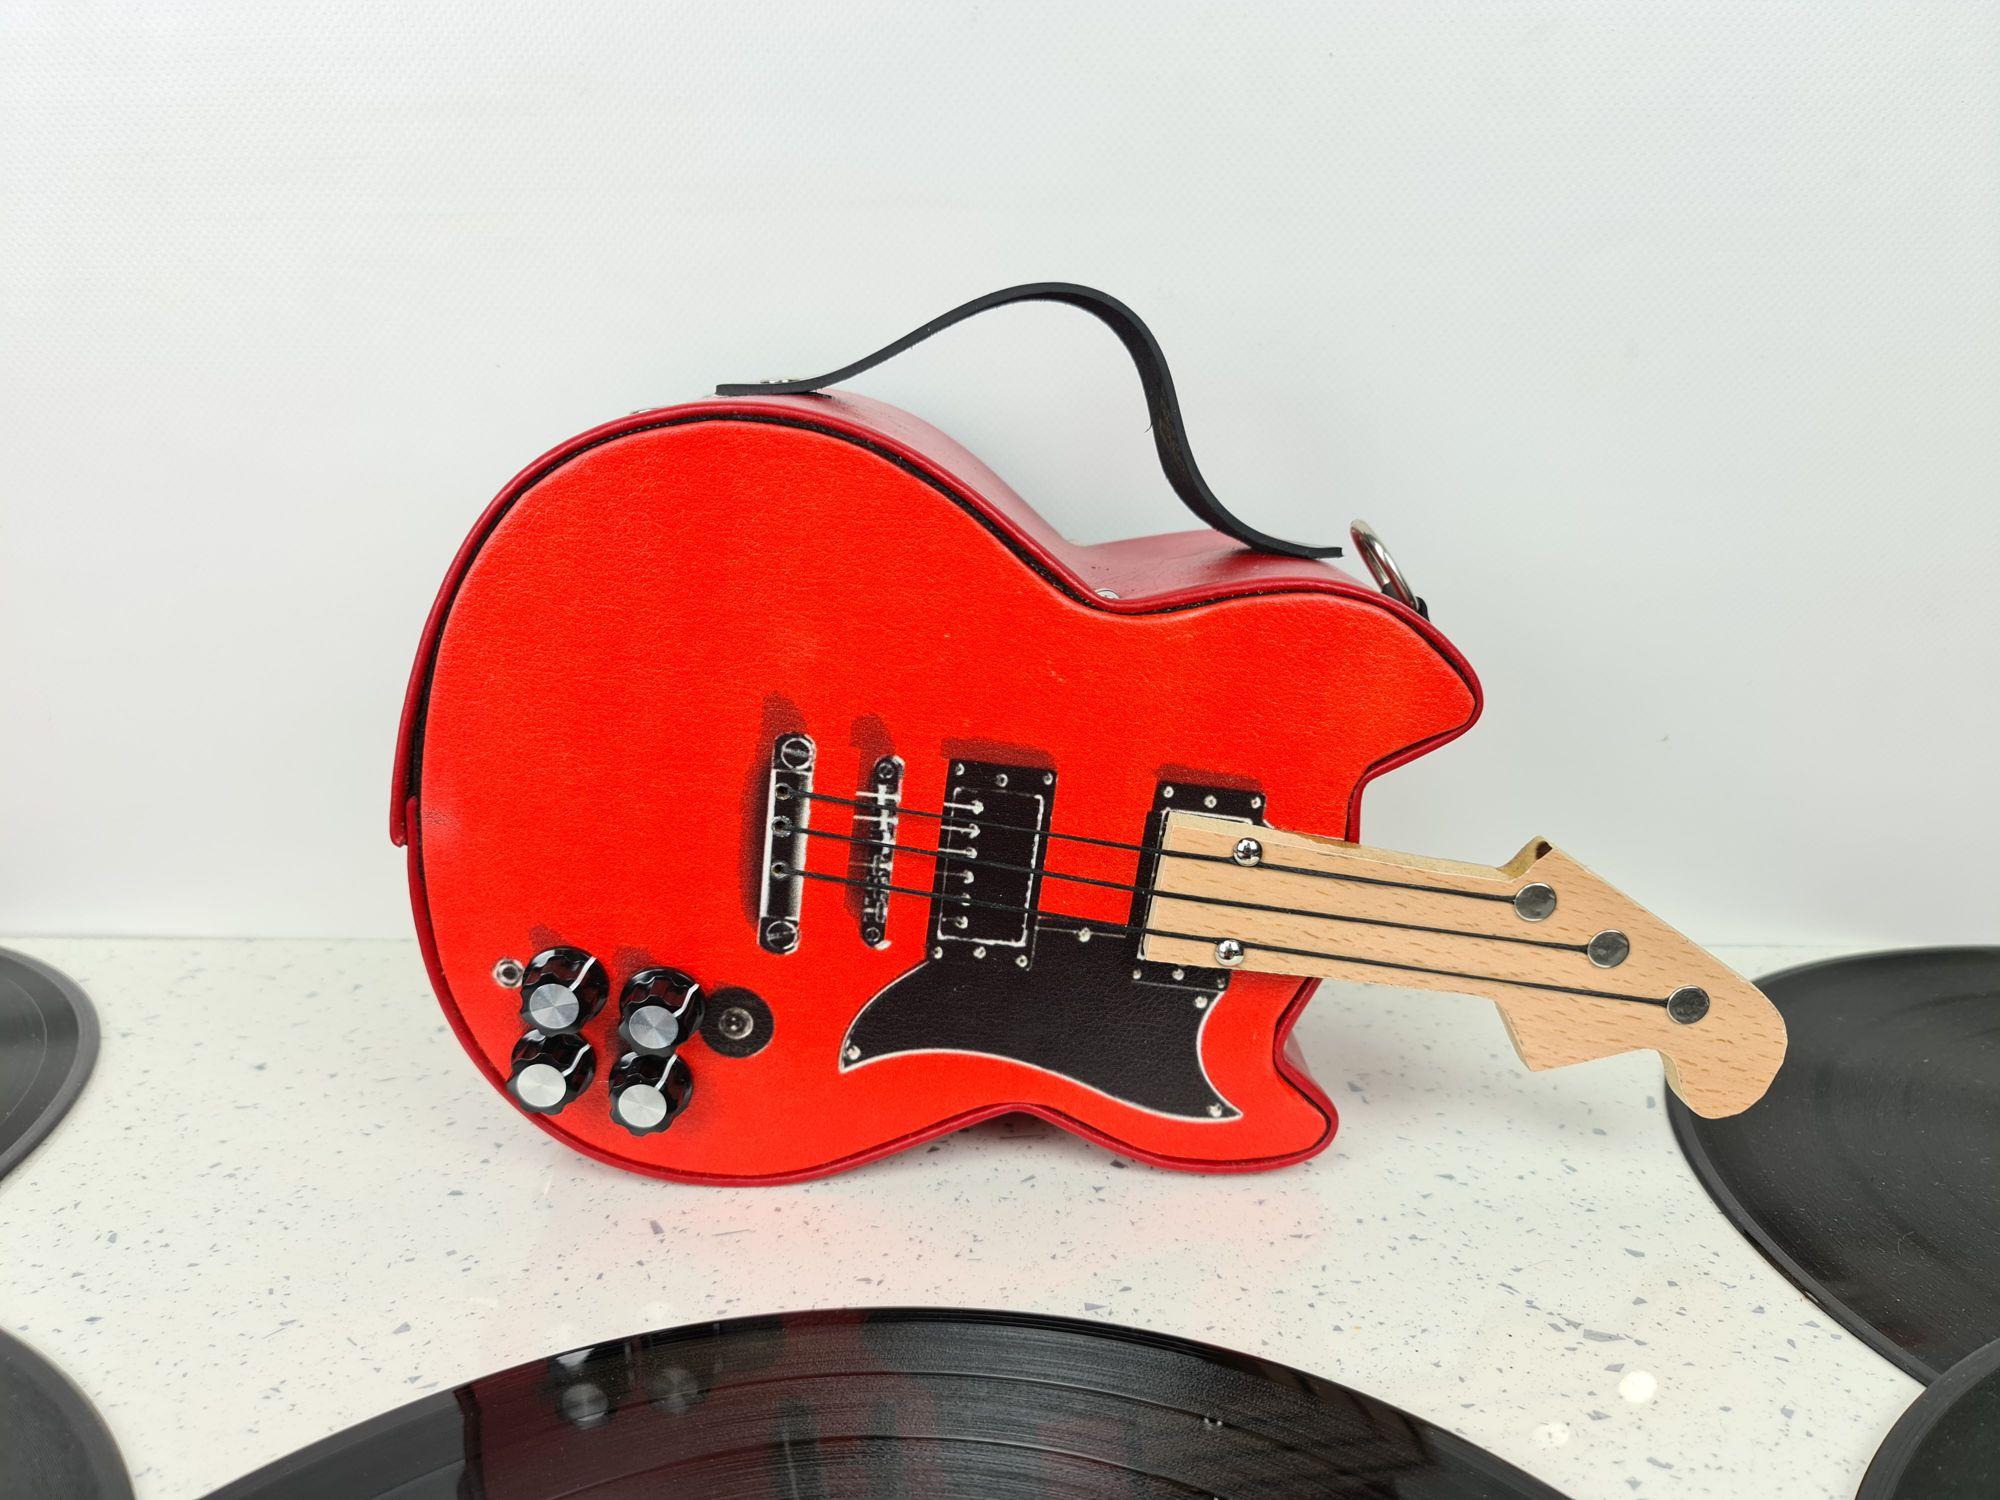 BA023_sac-a-main-pin-up-rockabilly-retro-rocknroll-guitare